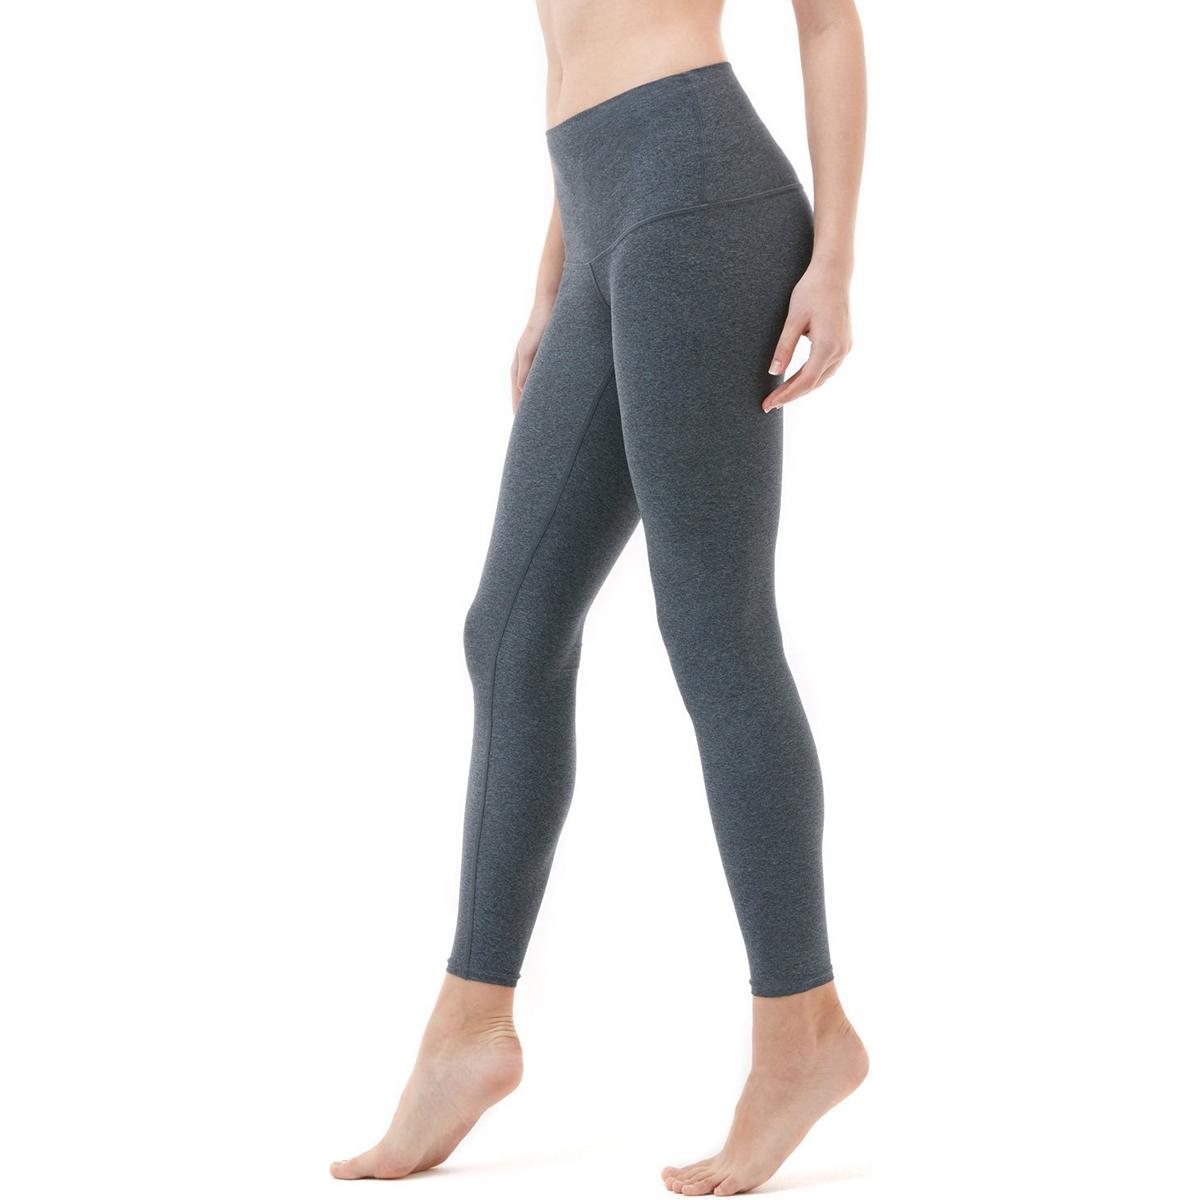 thumbnail 8 - TSLA Tesla FYP52 Women's High-Waisted Ultra-Stretch Tummy Control Yoga Pants